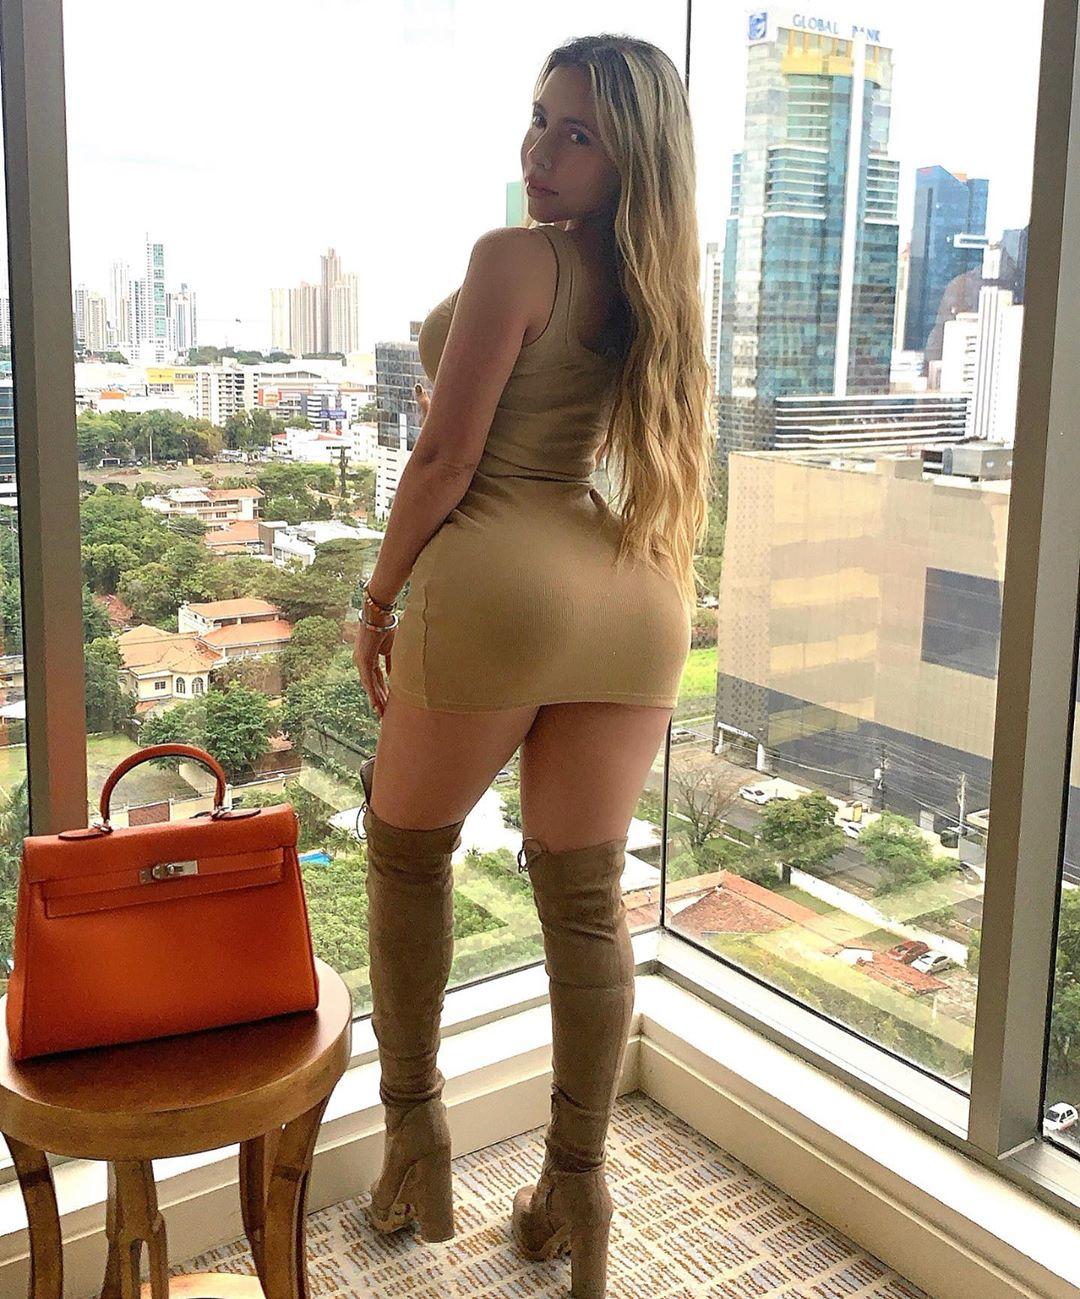 vanessa_bohorquez027.jpg